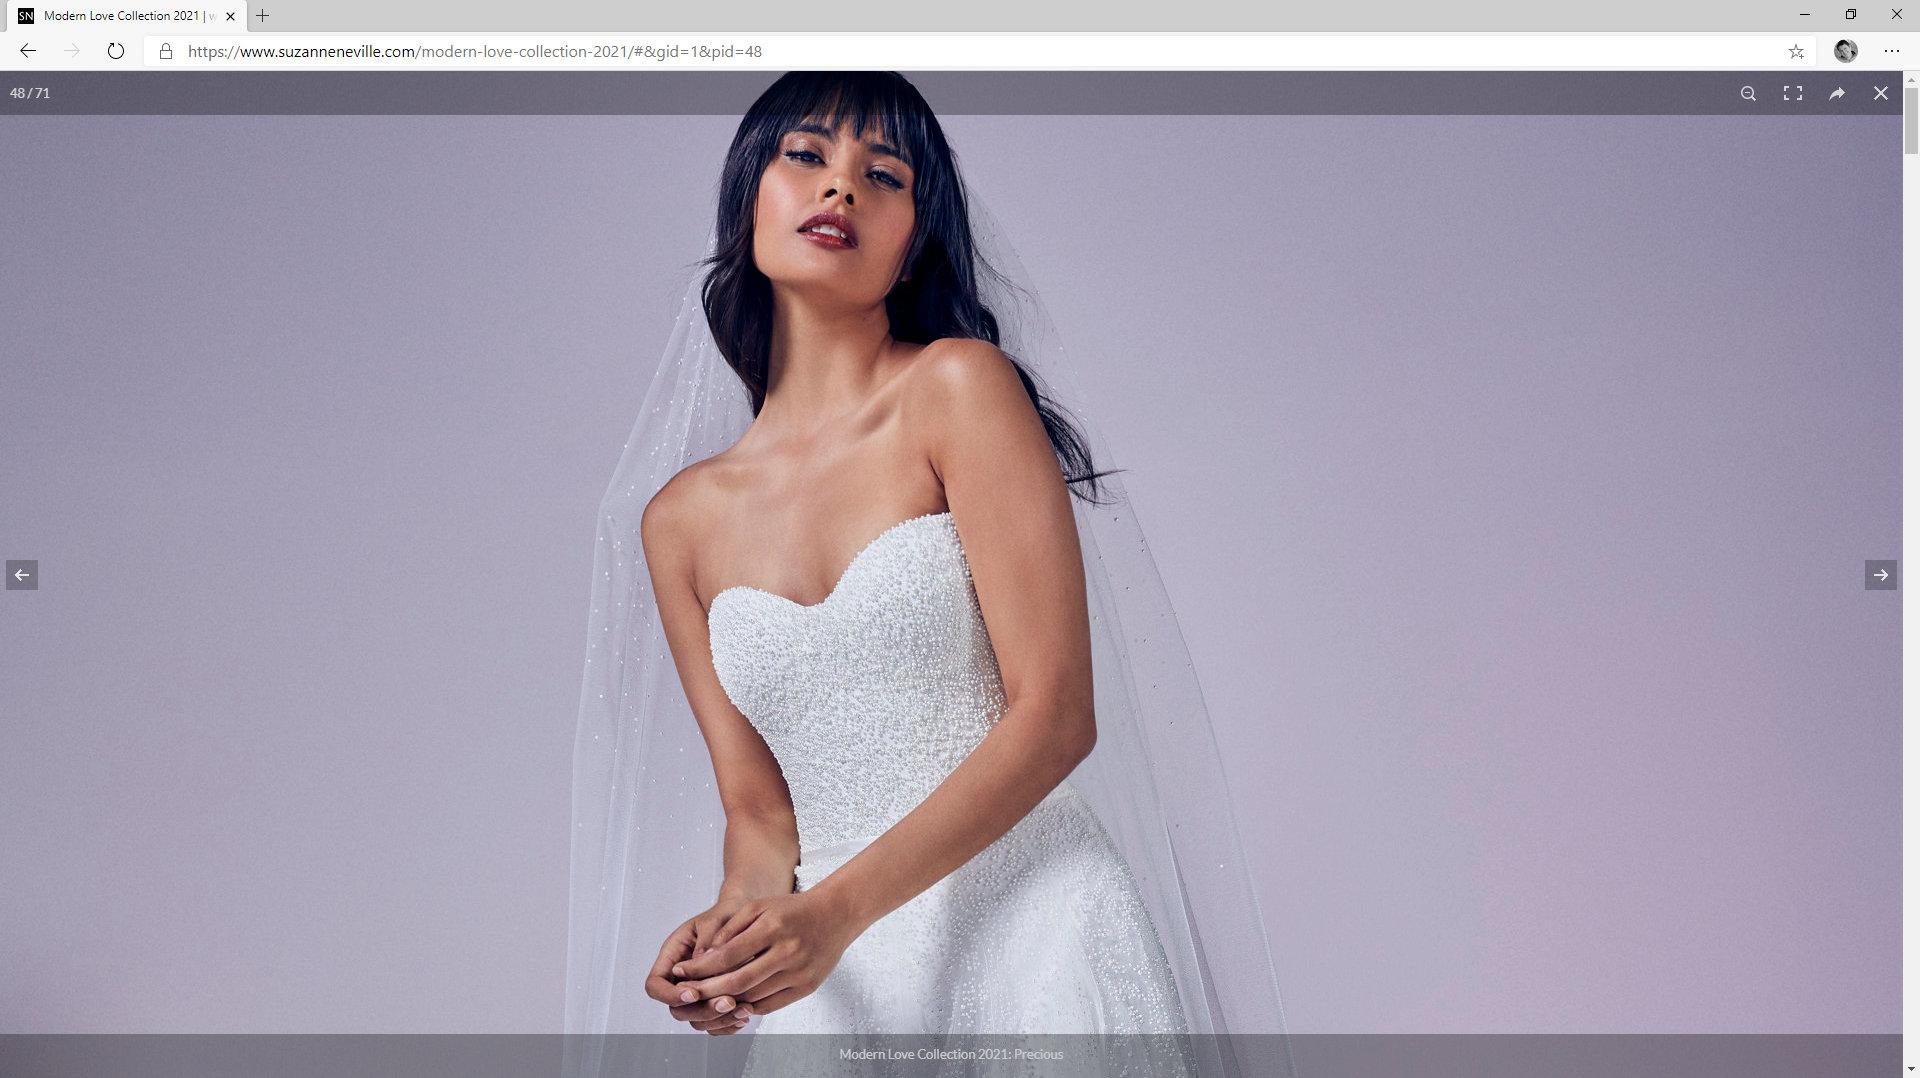 Bridal Collection 2020 | Modern Love | Suzanne Neville